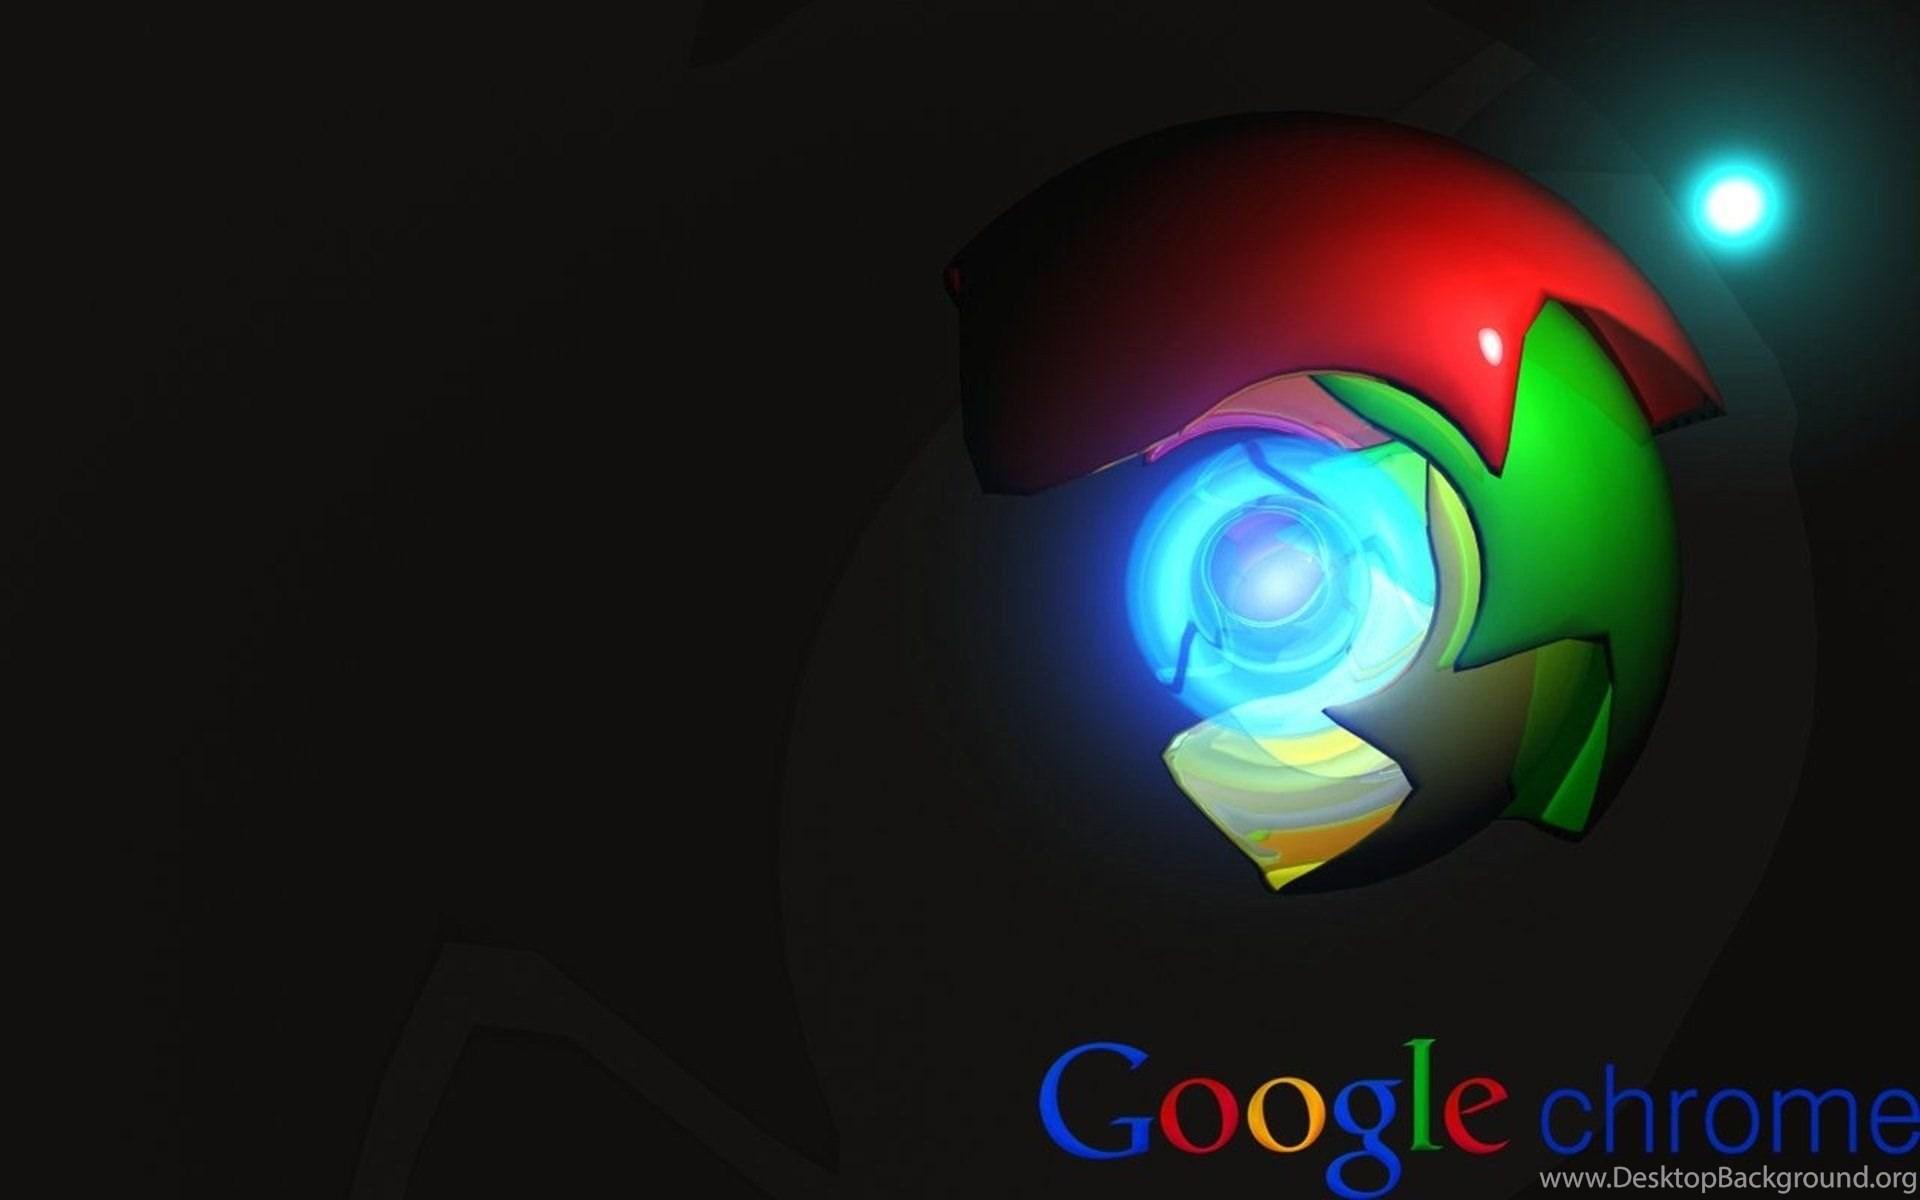 google chrome computer logo poster wallpapers desktop background